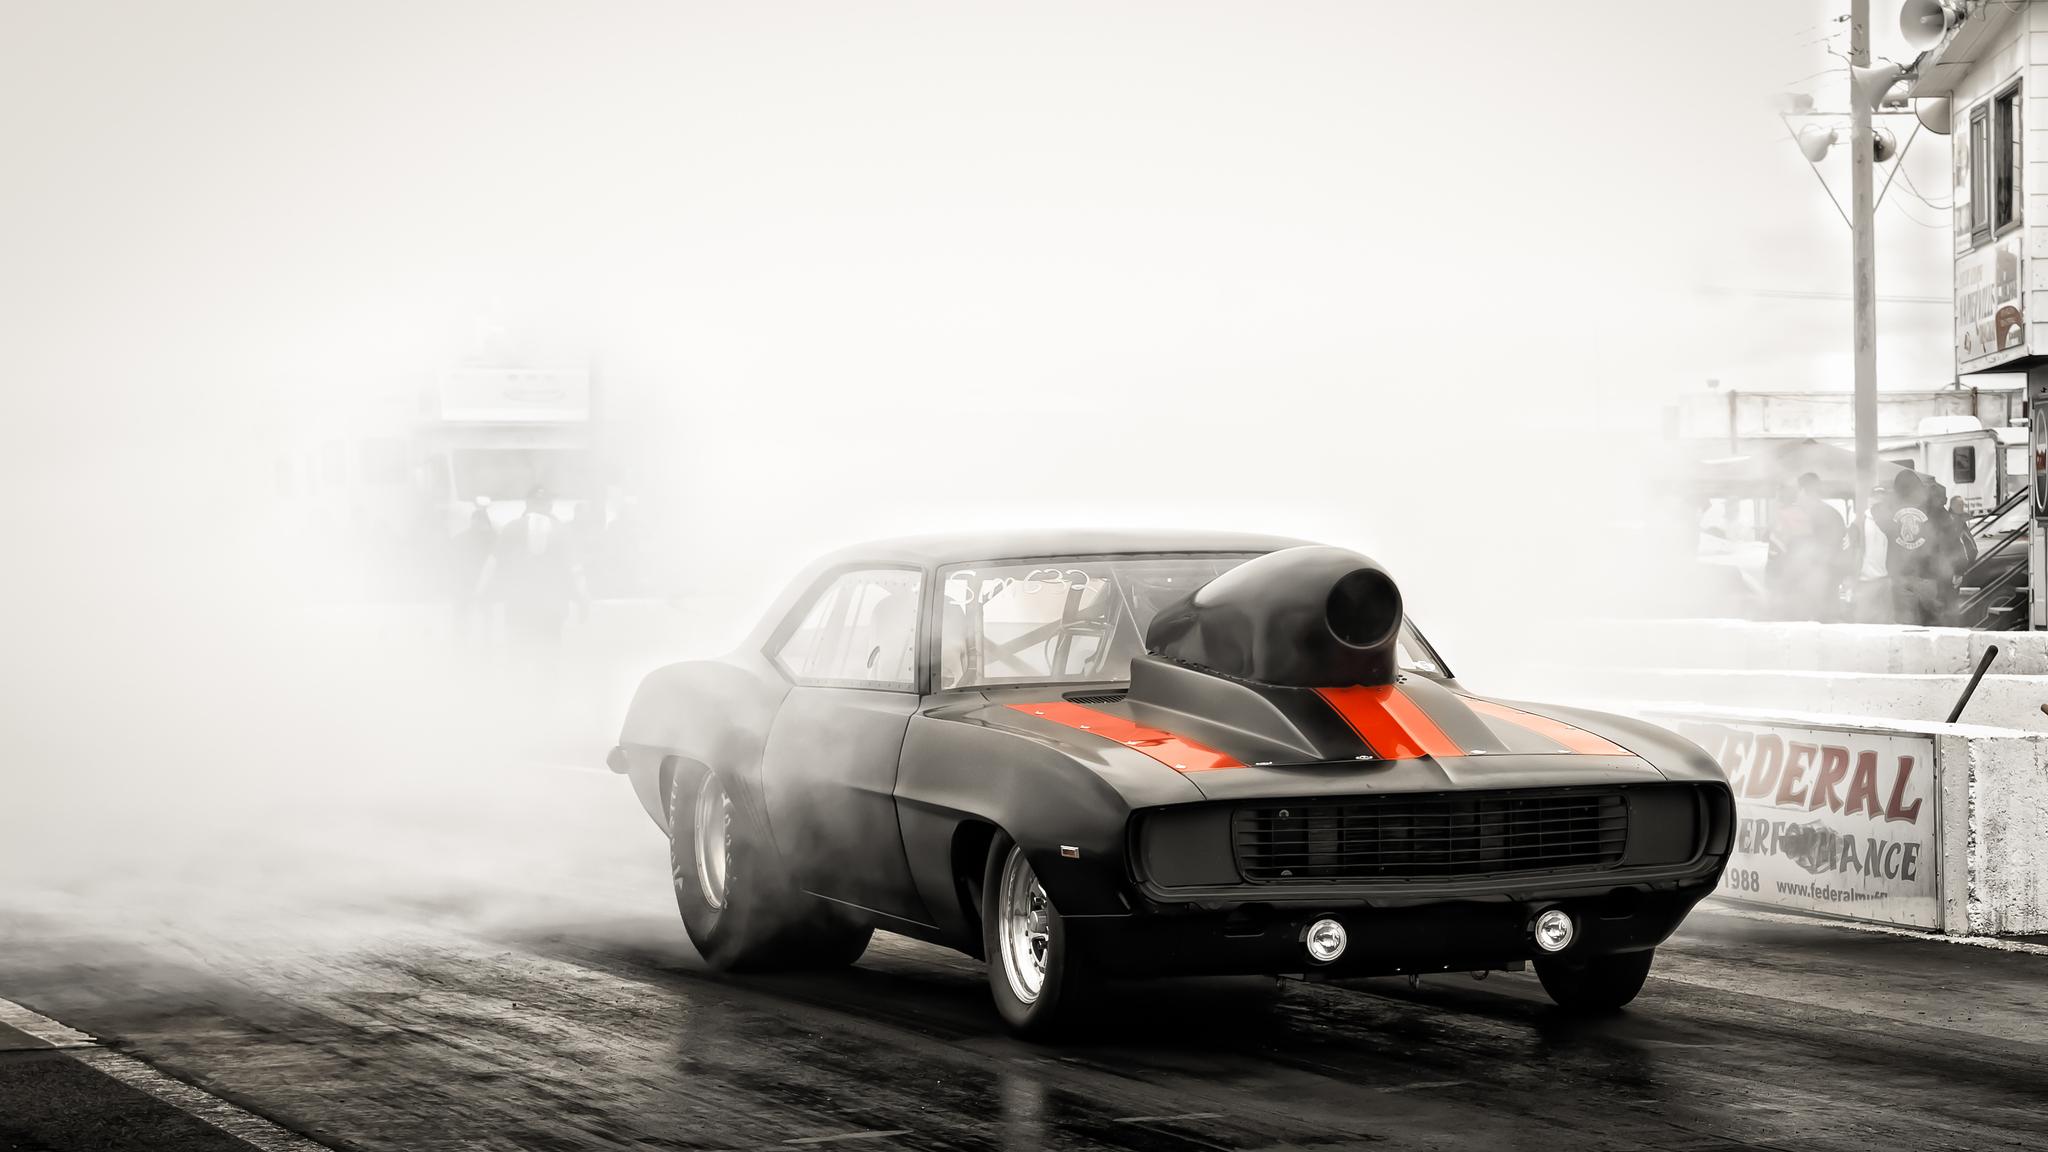 Cute Wallpapers  2048x1152 Drag Racing Car 2048x1152 Resolution Hd 4k